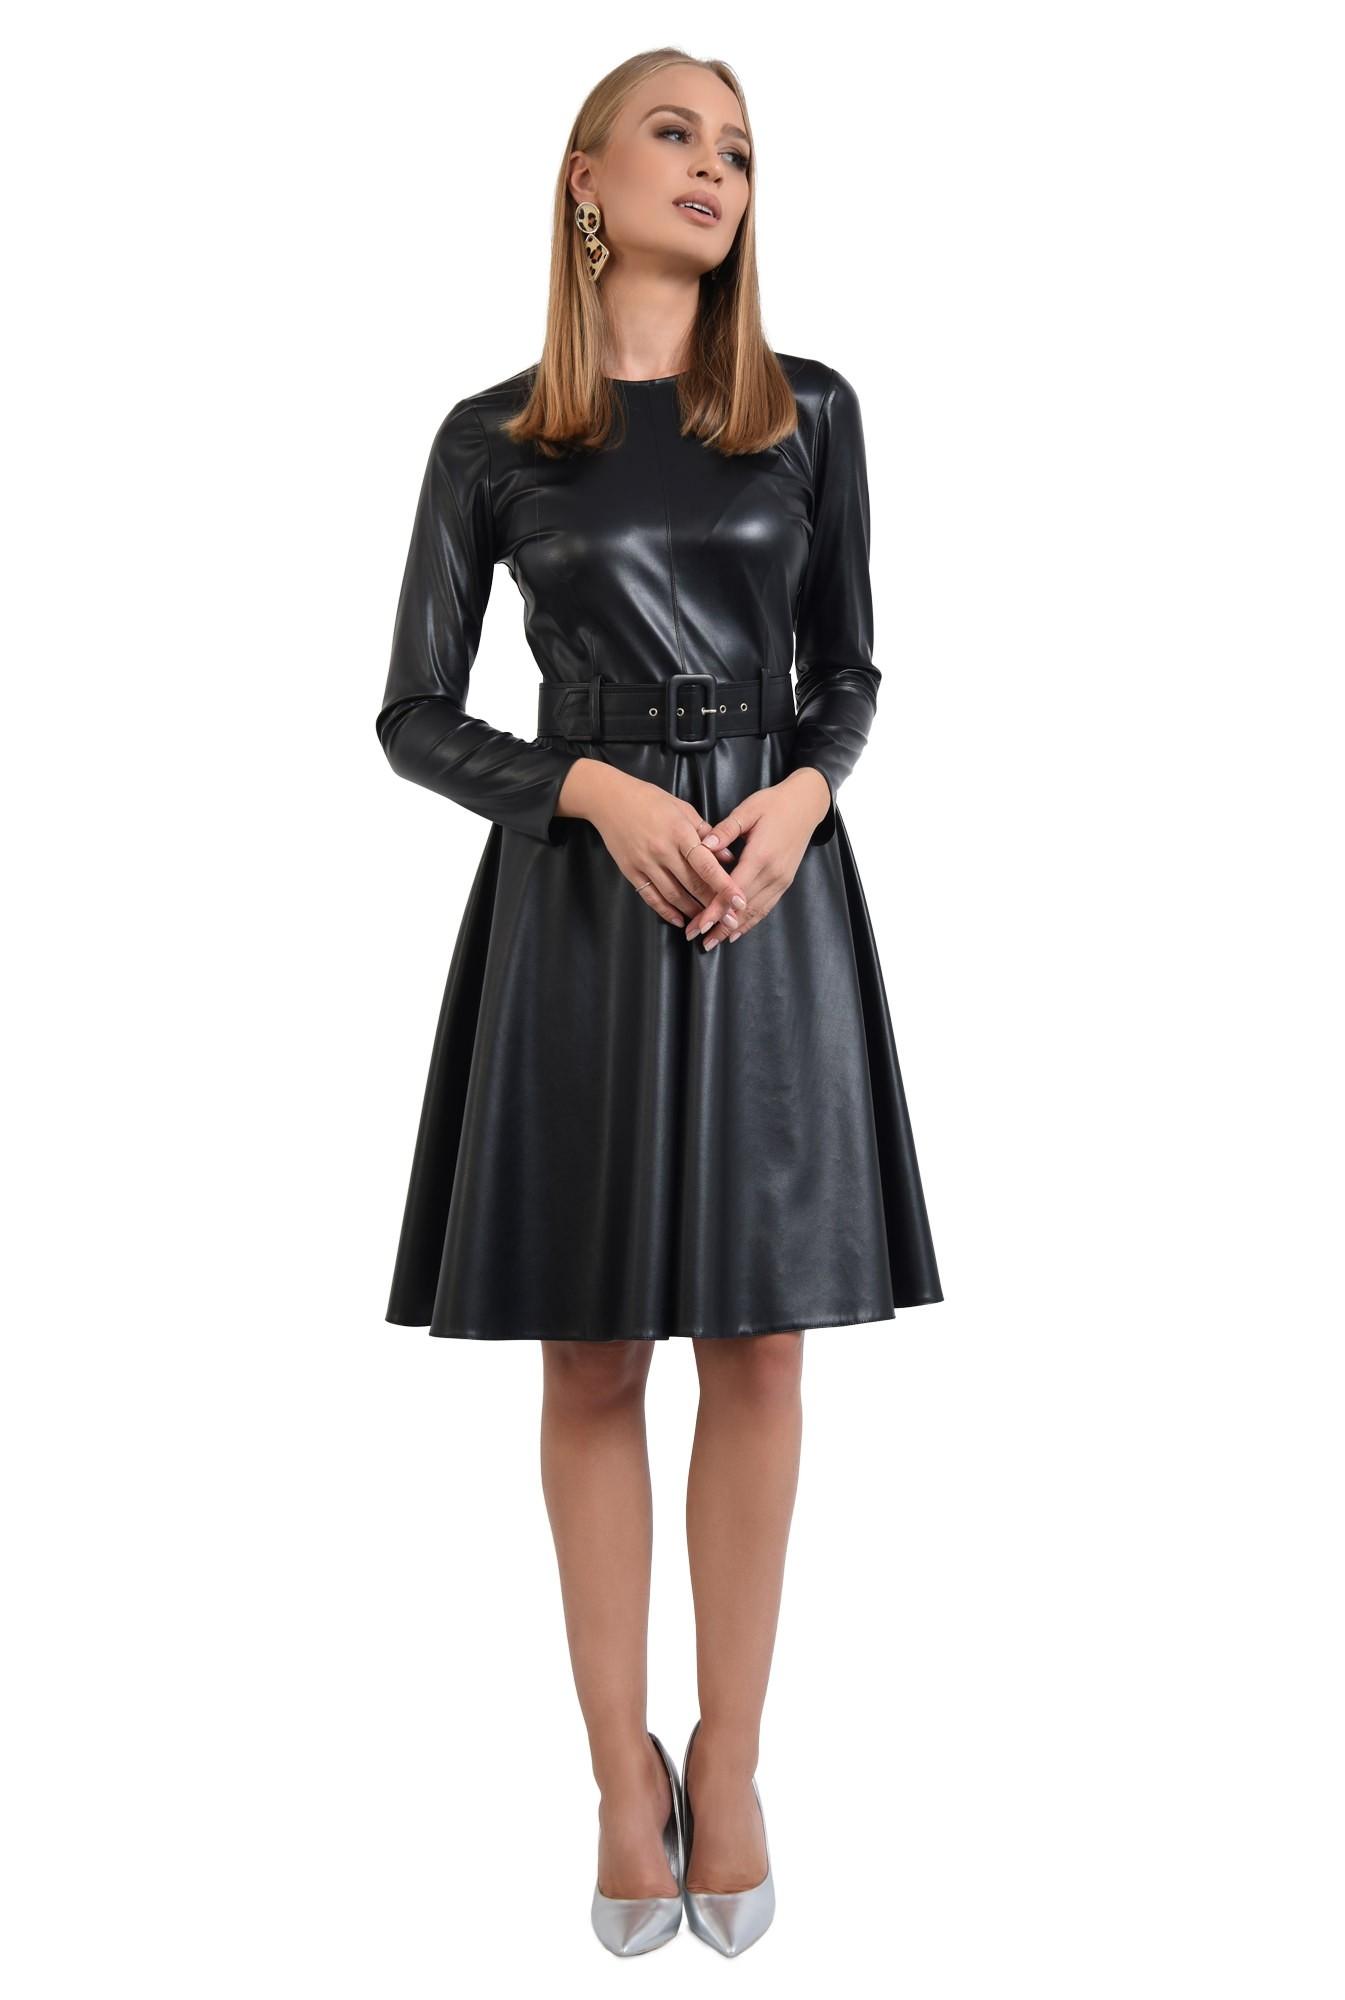 rochie casual neagra, cusatura mediana, fermoar la spate, rochii online